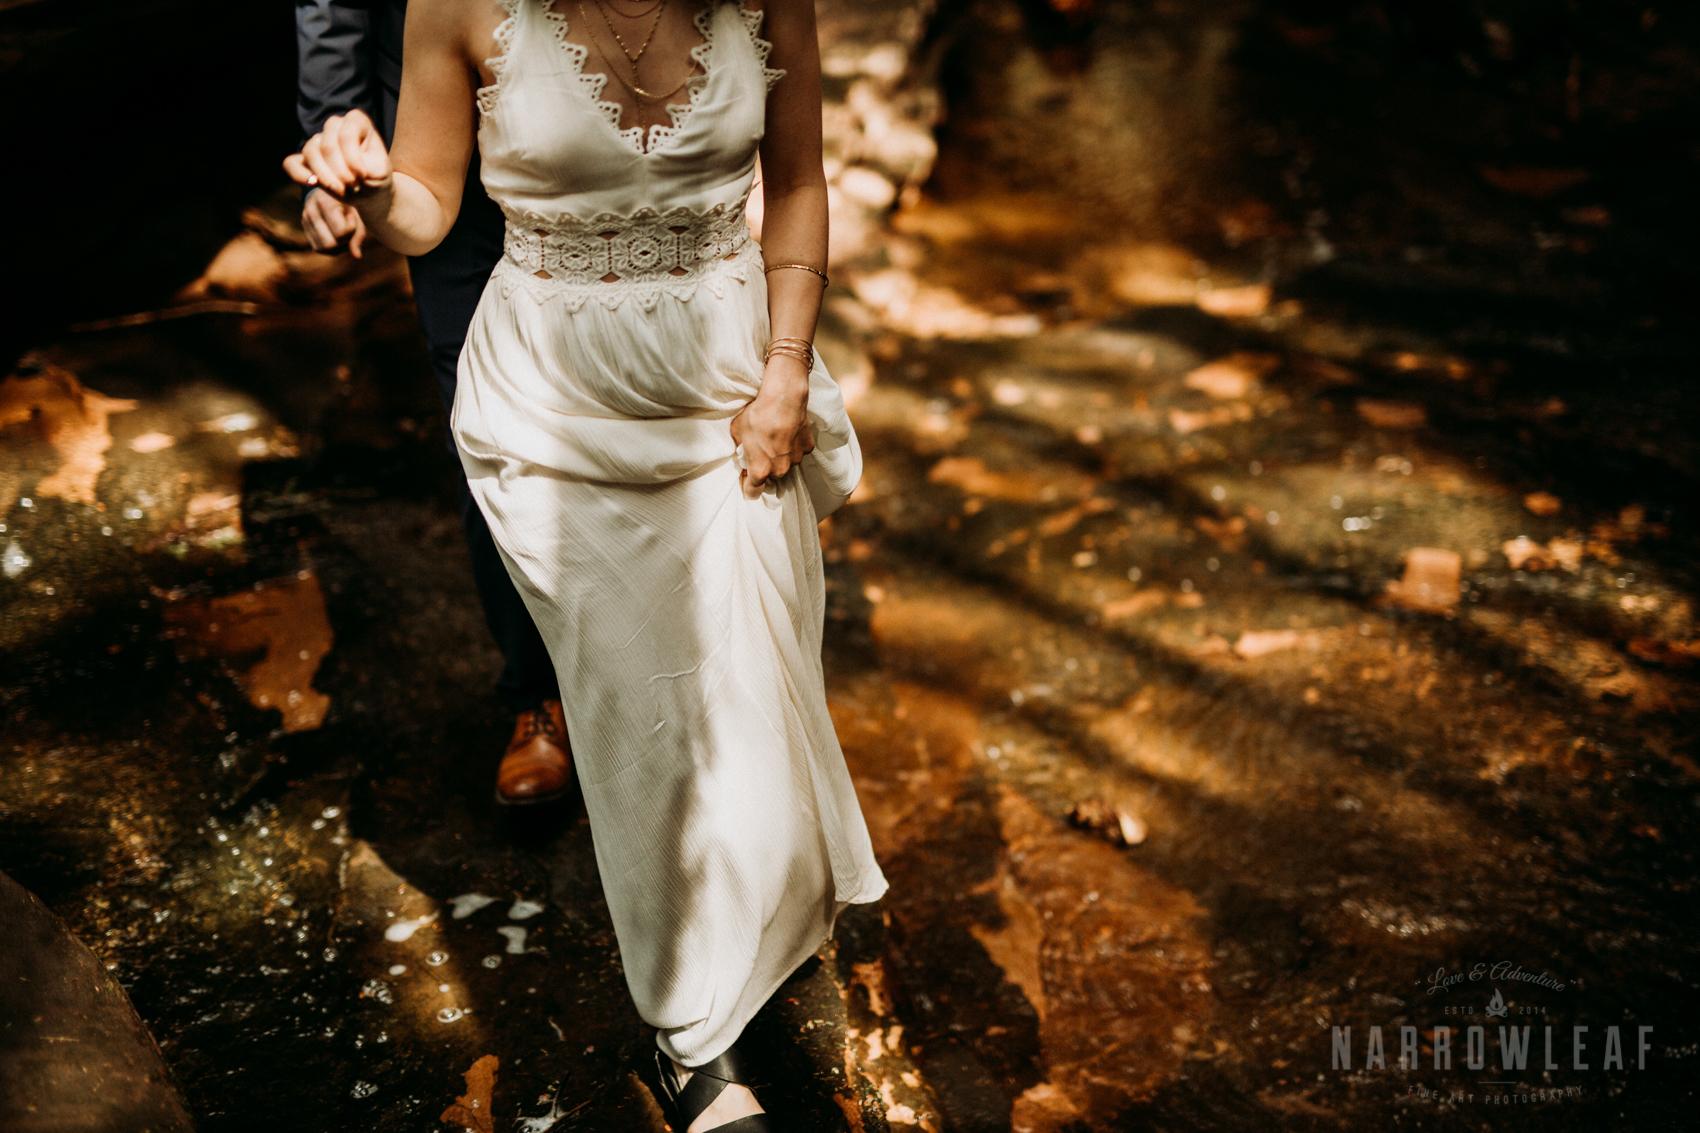 moody-lake-superior-hiking-adventure-elopement-NarrowLeaf-Photography-6641.jpg